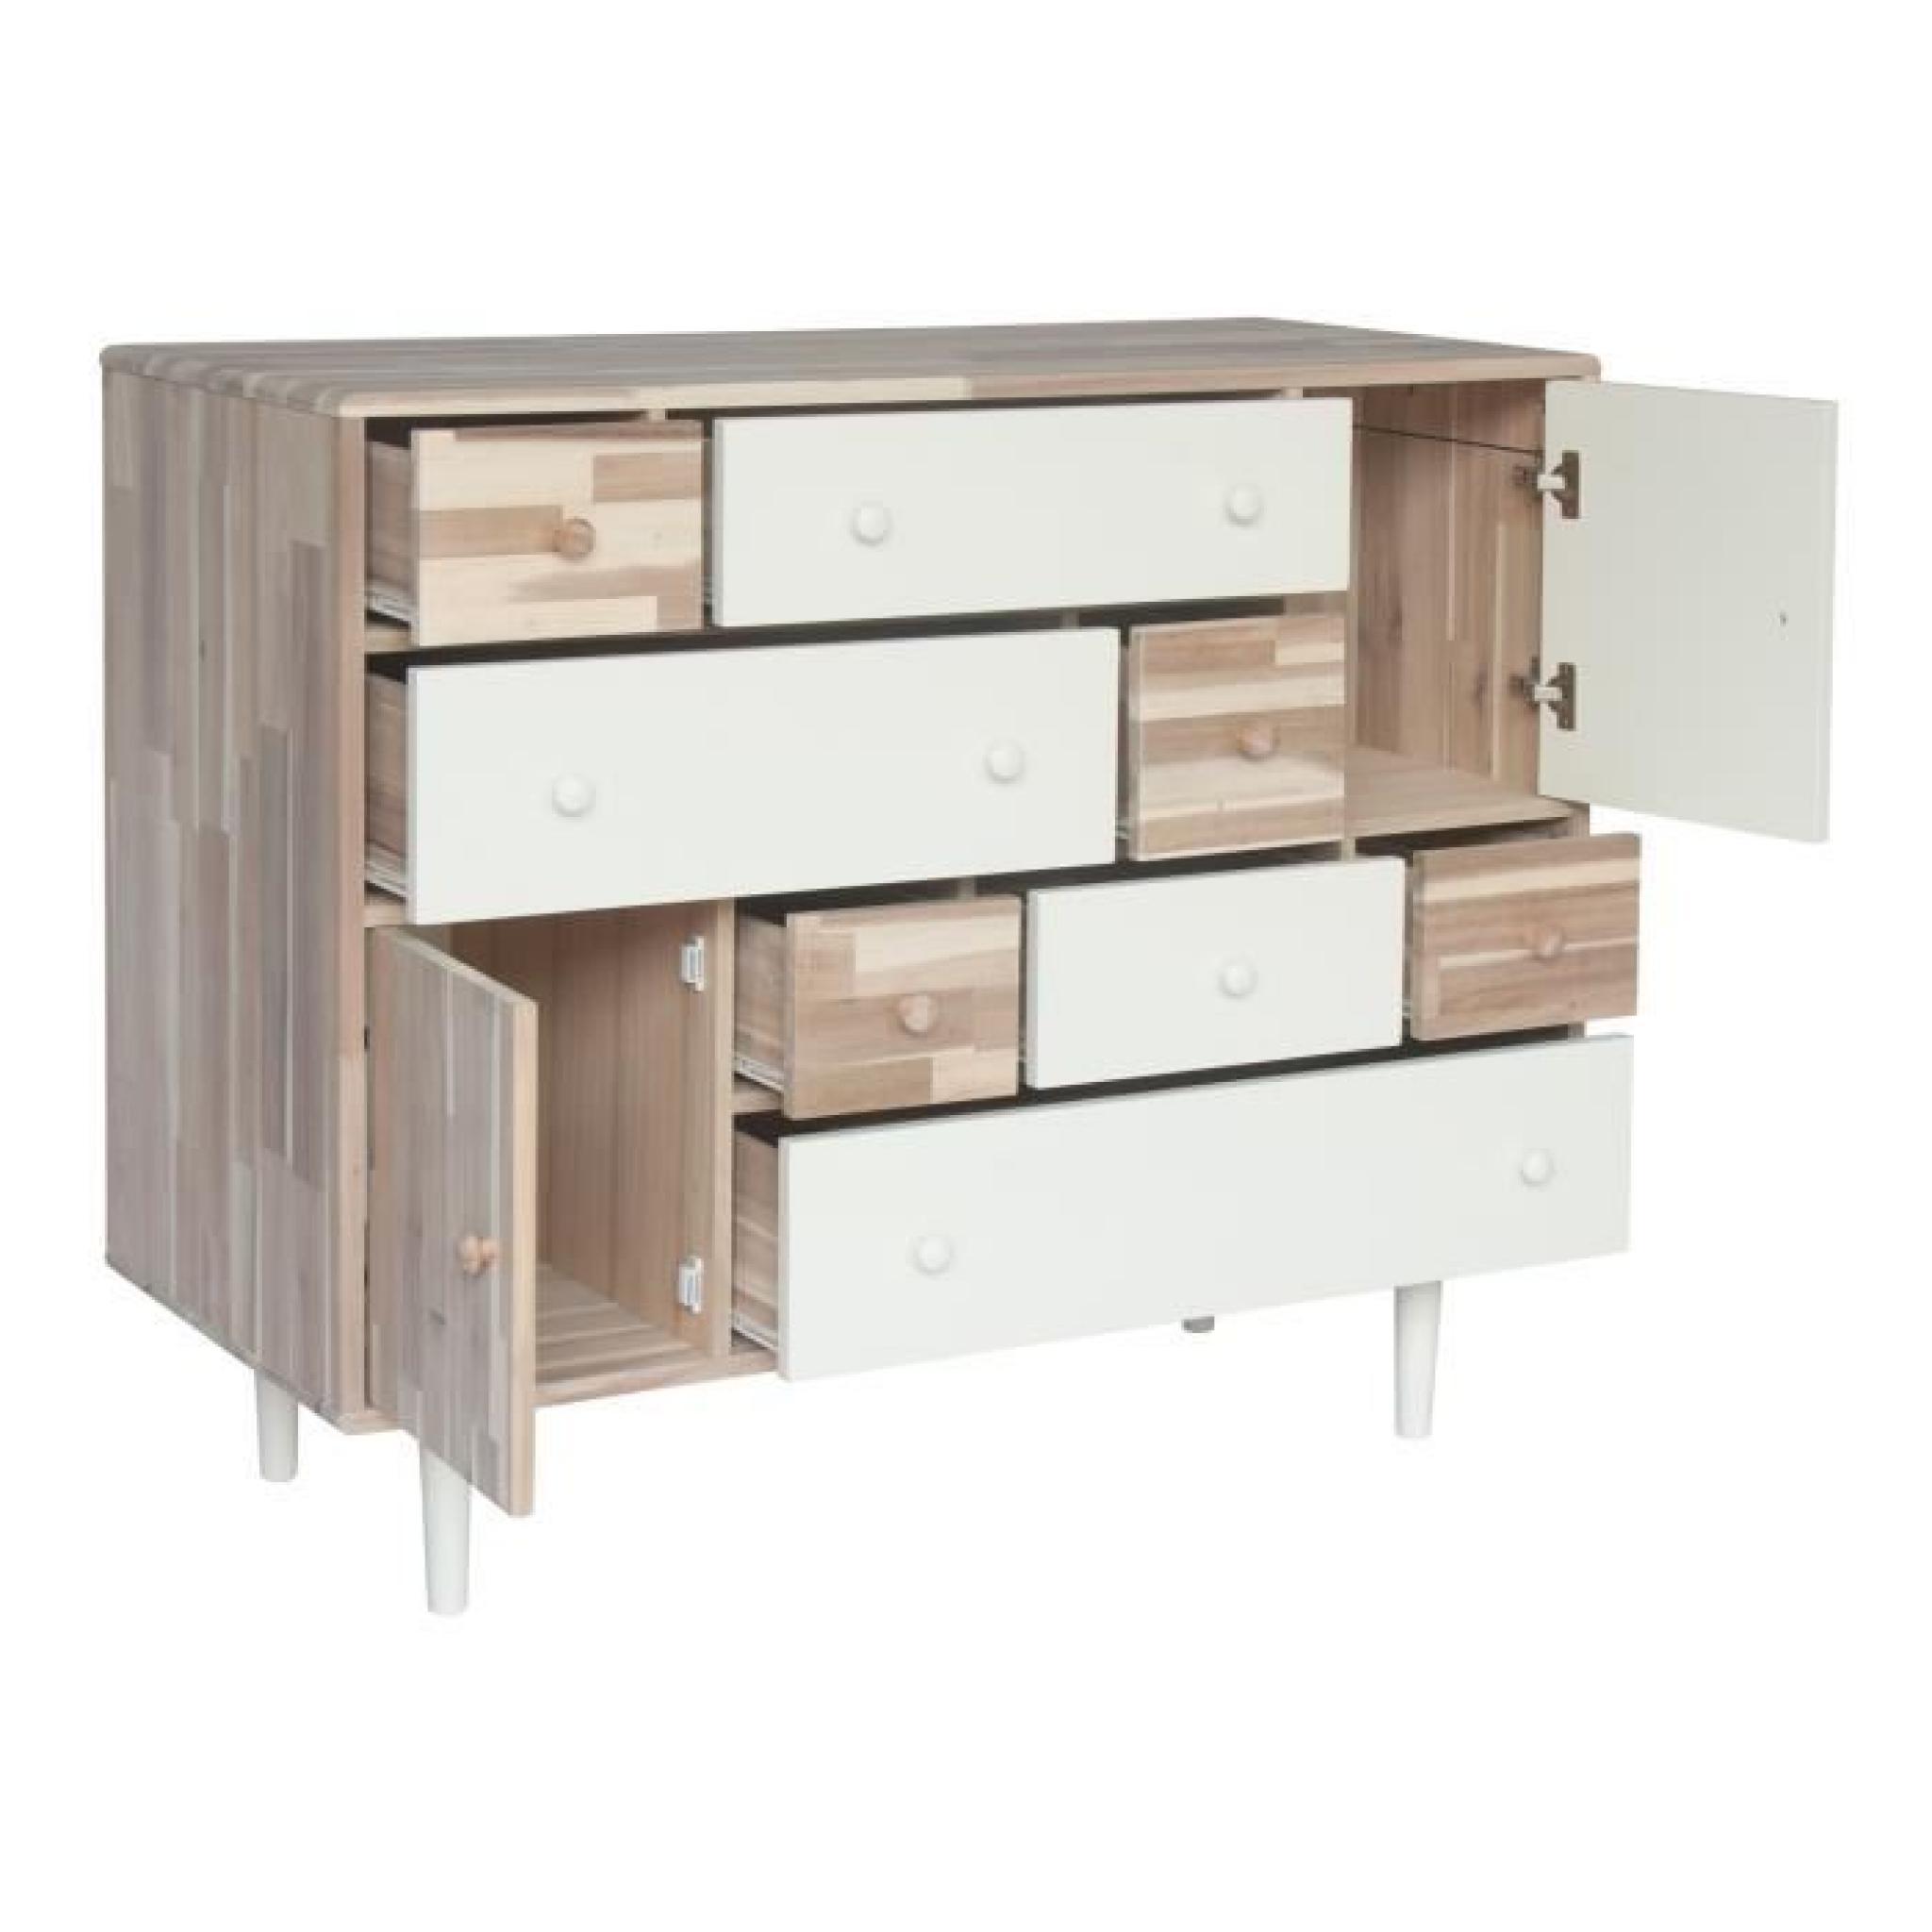 commode laquee blanche avec tiroirs rabattables meubles de design d 39 inspiration. Black Bedroom Furniture Sets. Home Design Ideas